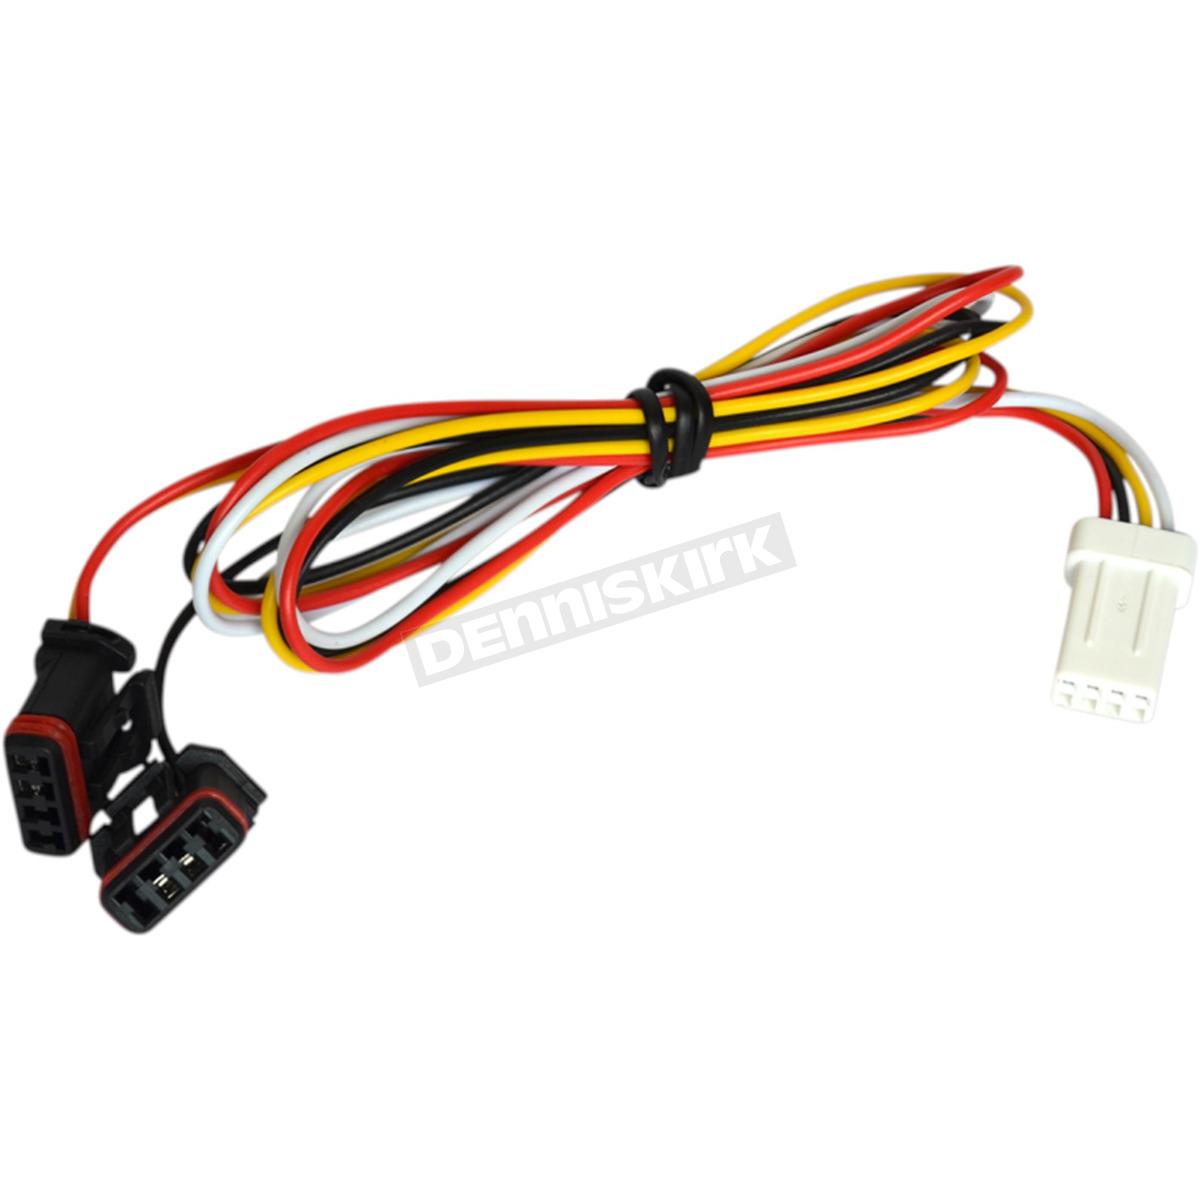 hight resolution of powermadd star series handguard led turn signal plug n play wire harness 34292